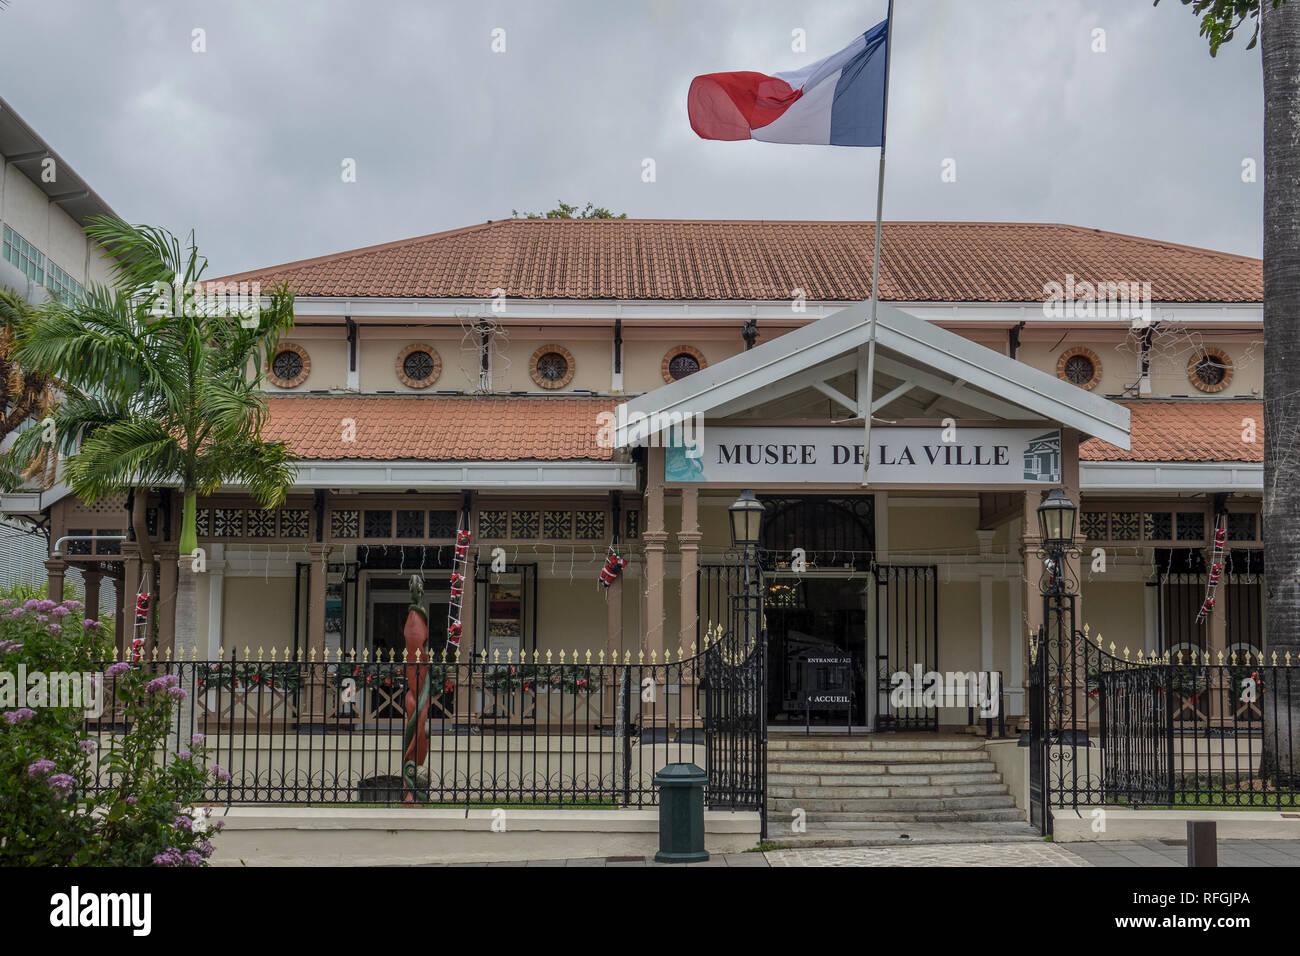 New Caledonia, Noumea, City Museum - Stock Image